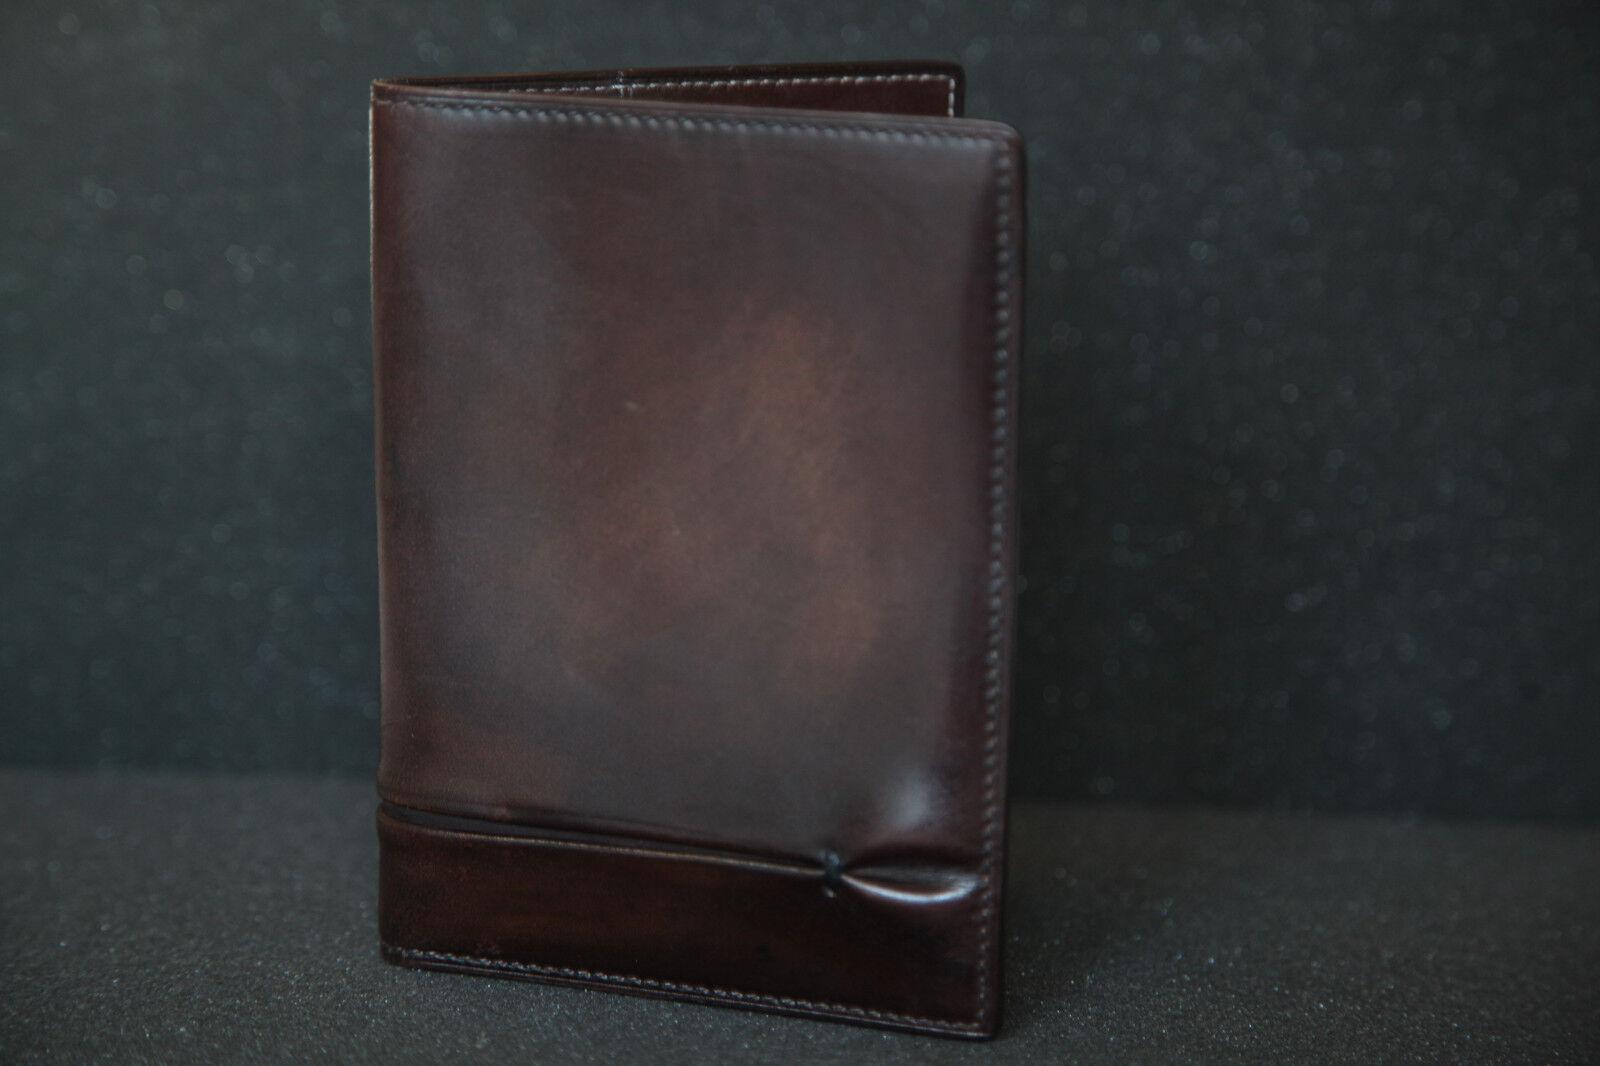 BERLUTI Wallet Piercing Venezia Leather New!!